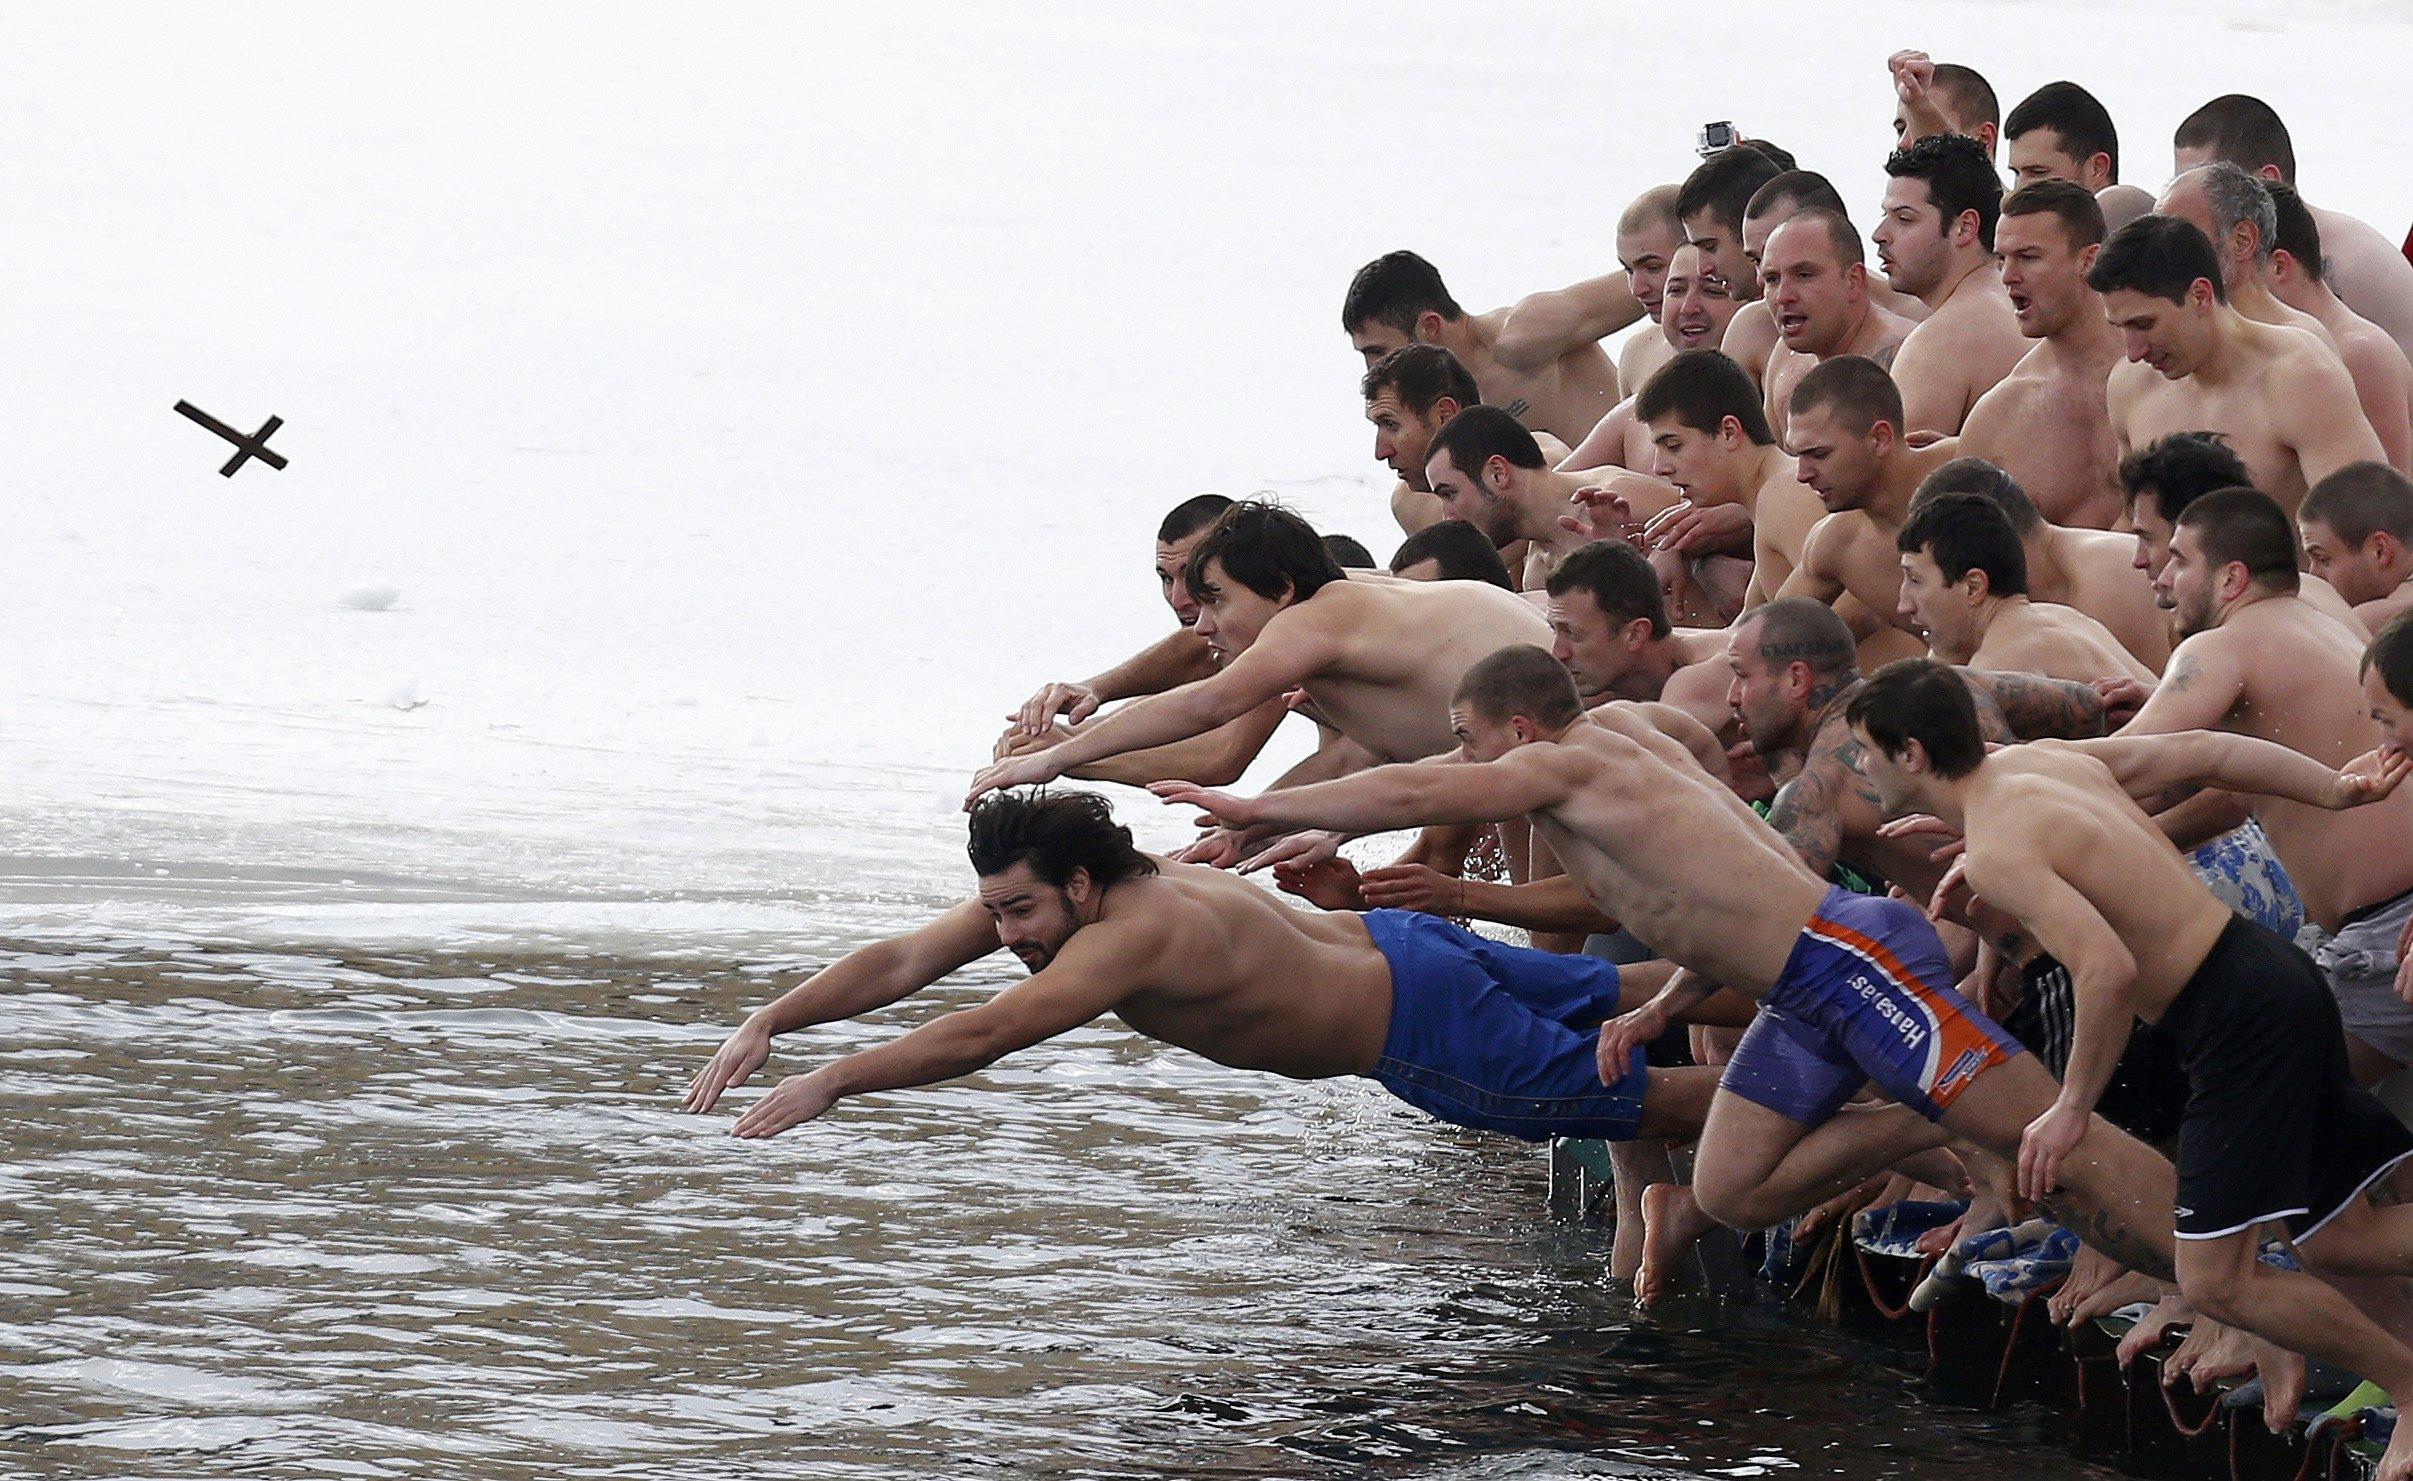 Crossdive Stoyan Nenov Reuters